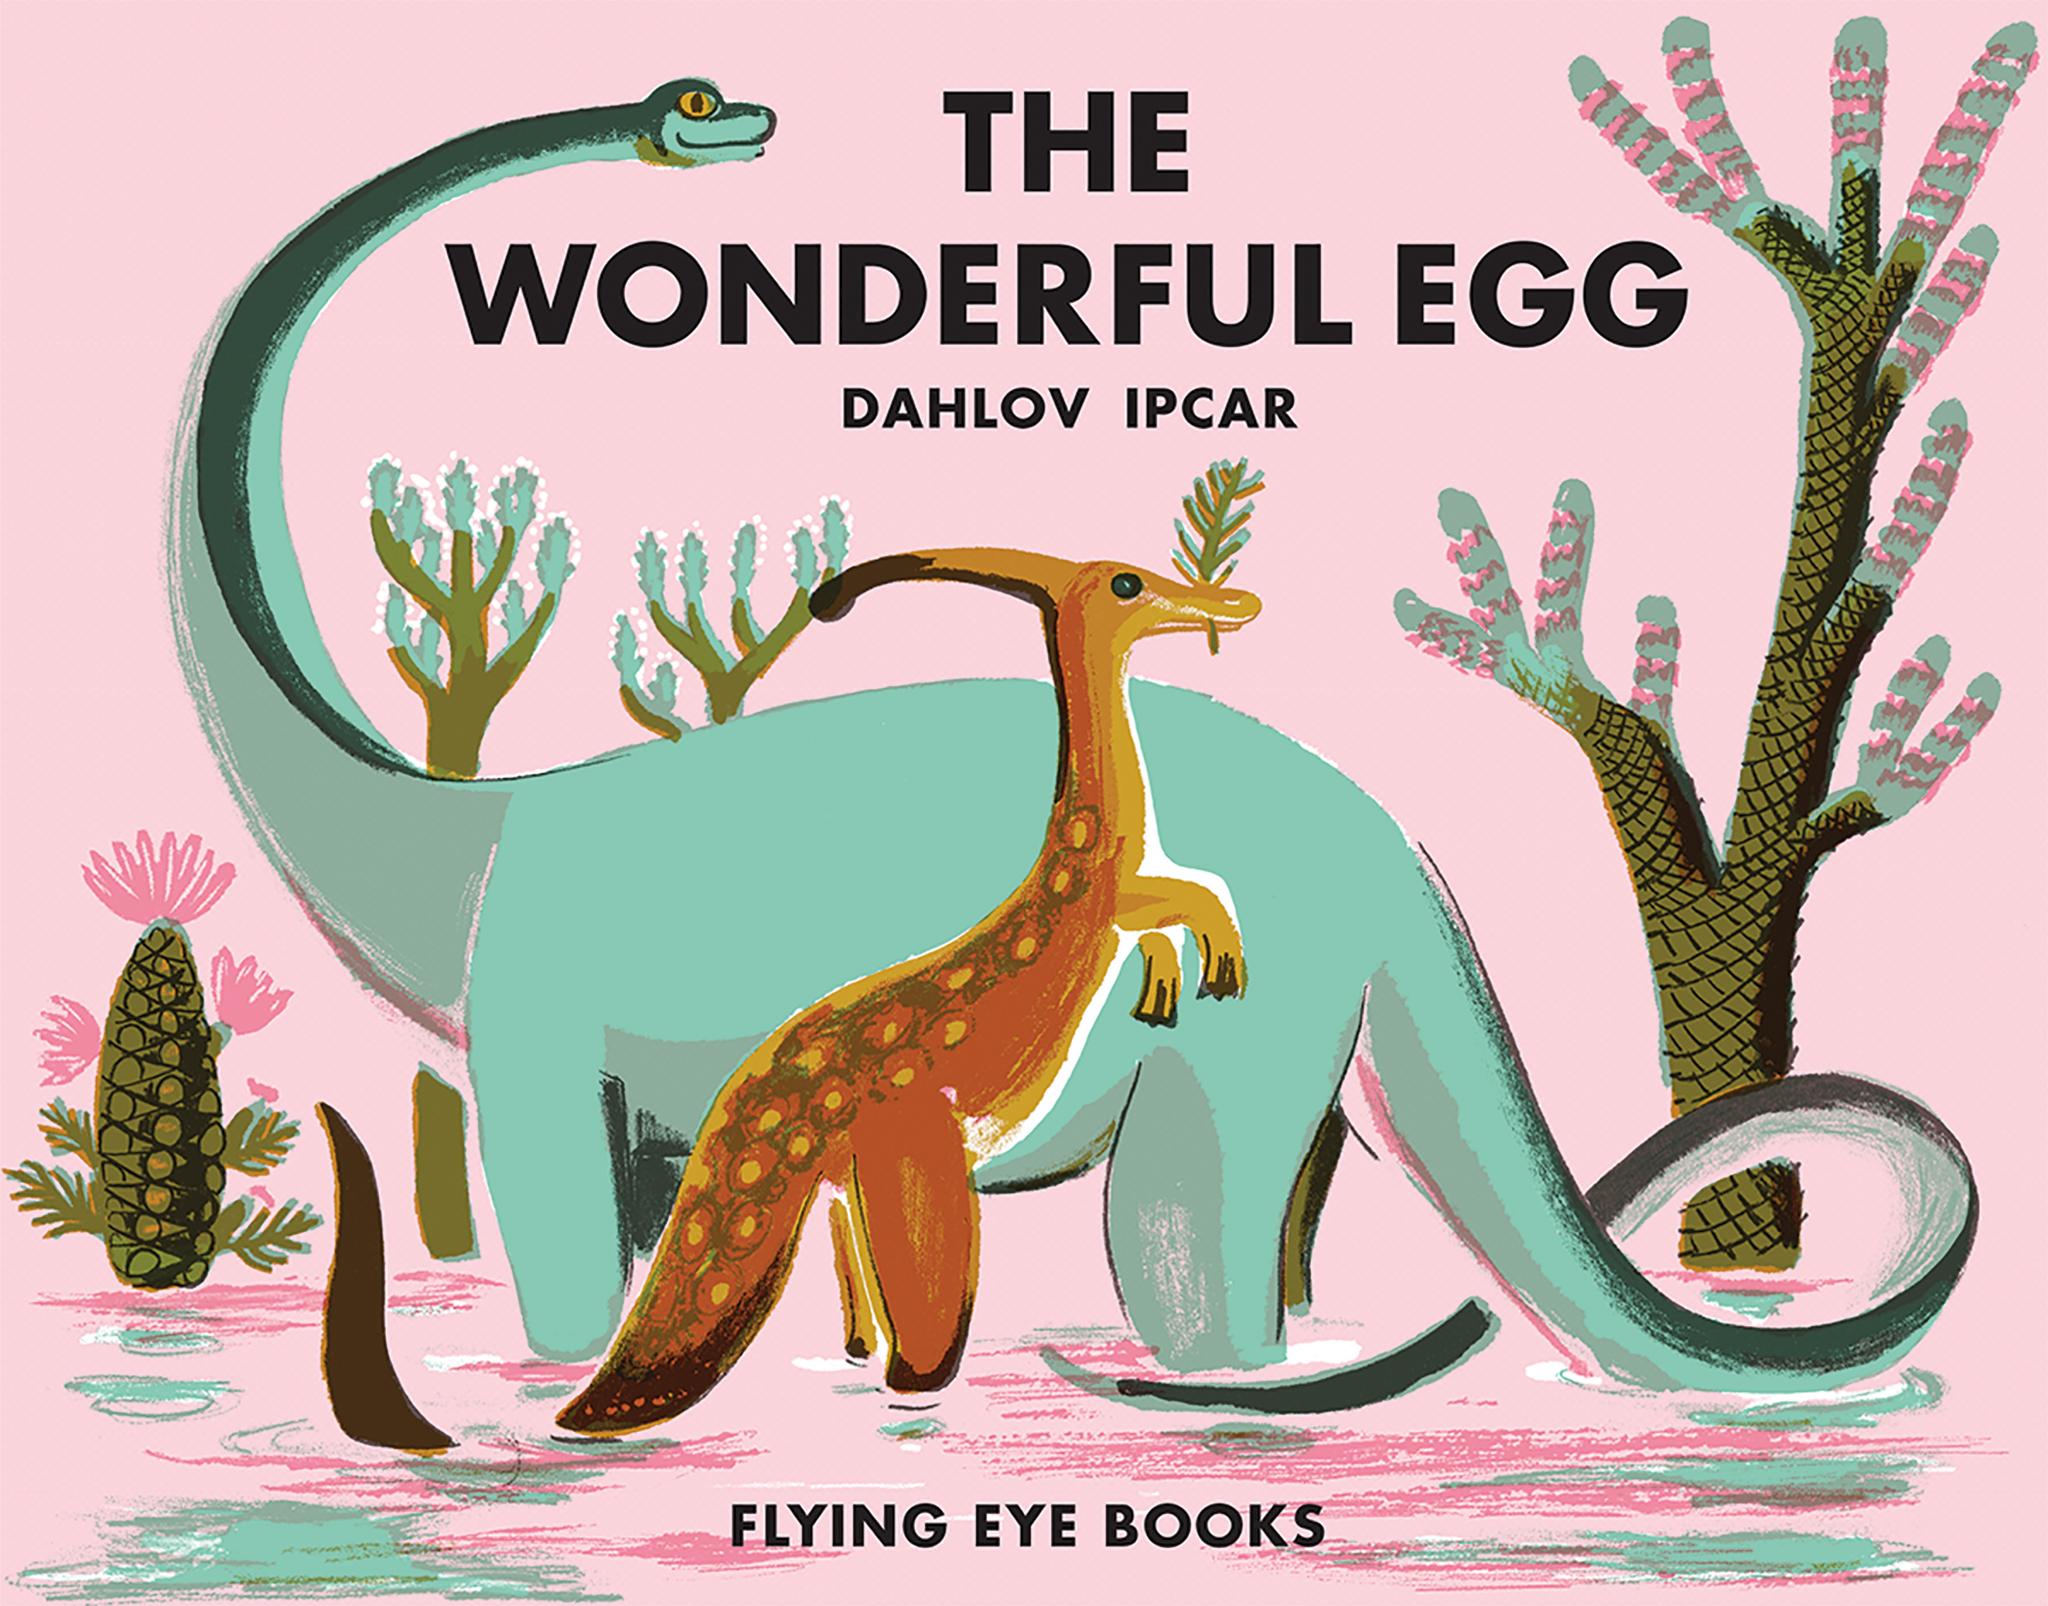 The Wonderful Egg